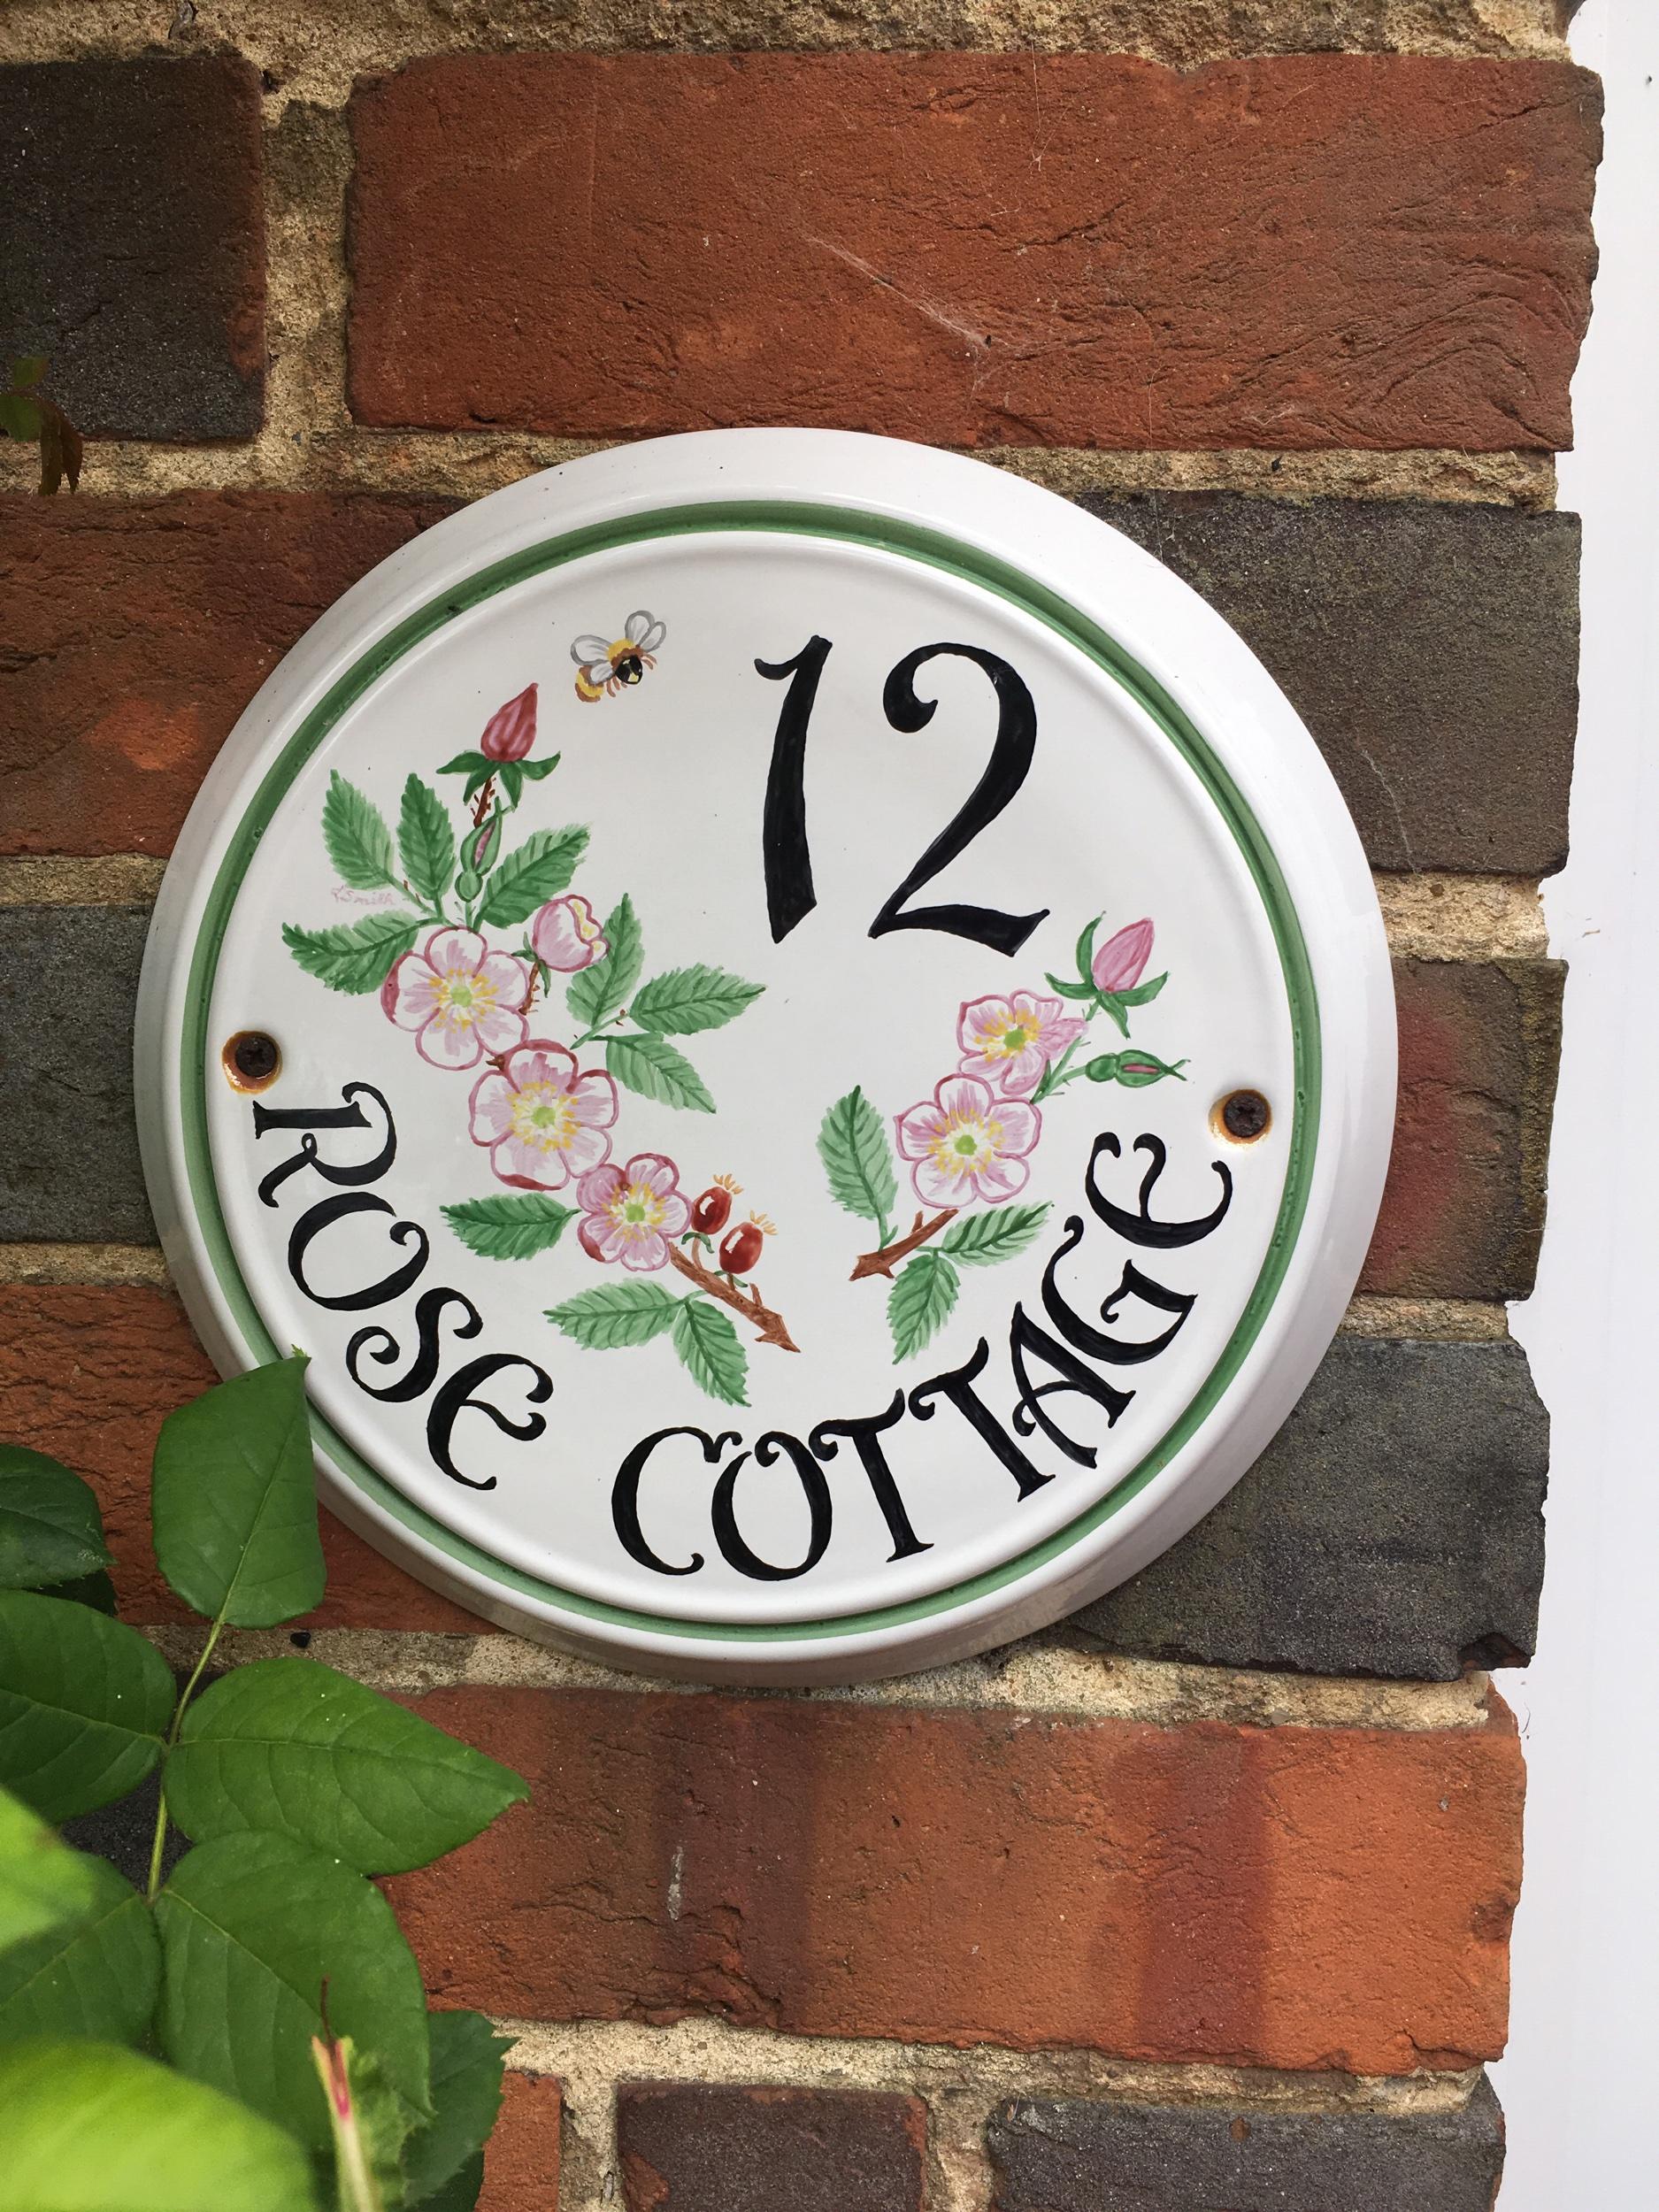 Rose Cottage - how lovely!